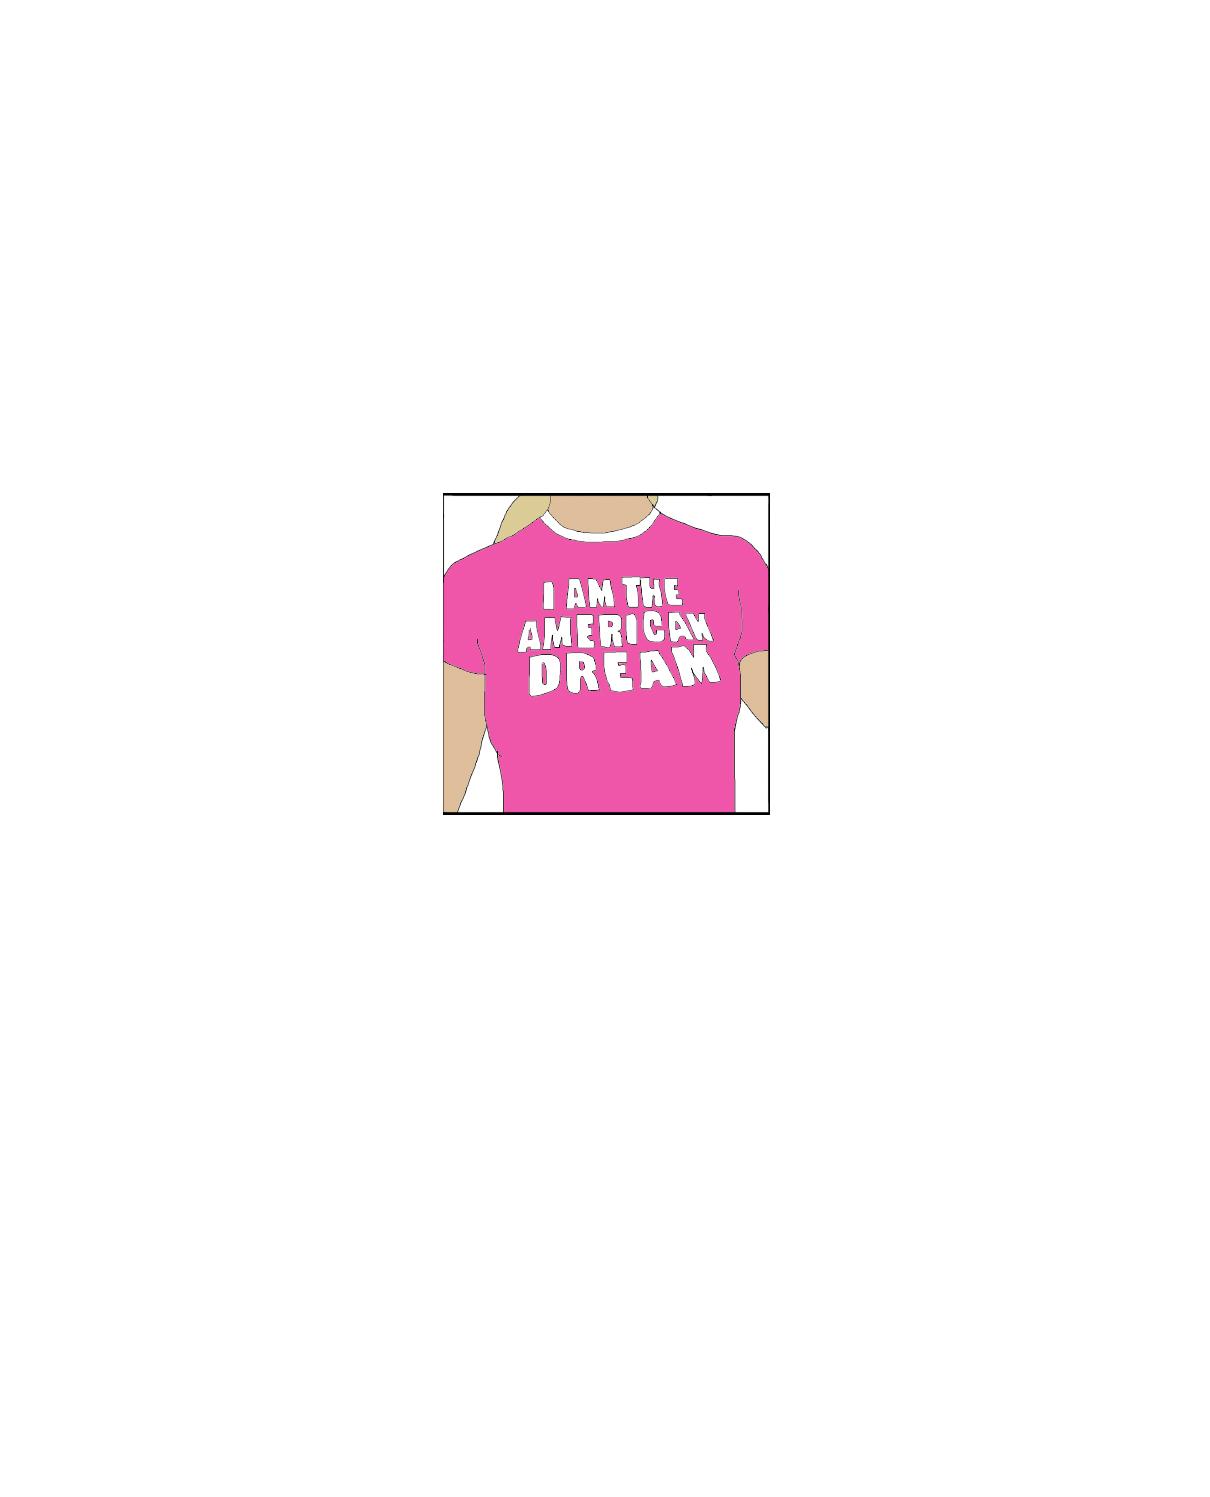 Best Britney Spears shirts (mini sketch inspired by an Ebony Demoness tweet) — June 2017